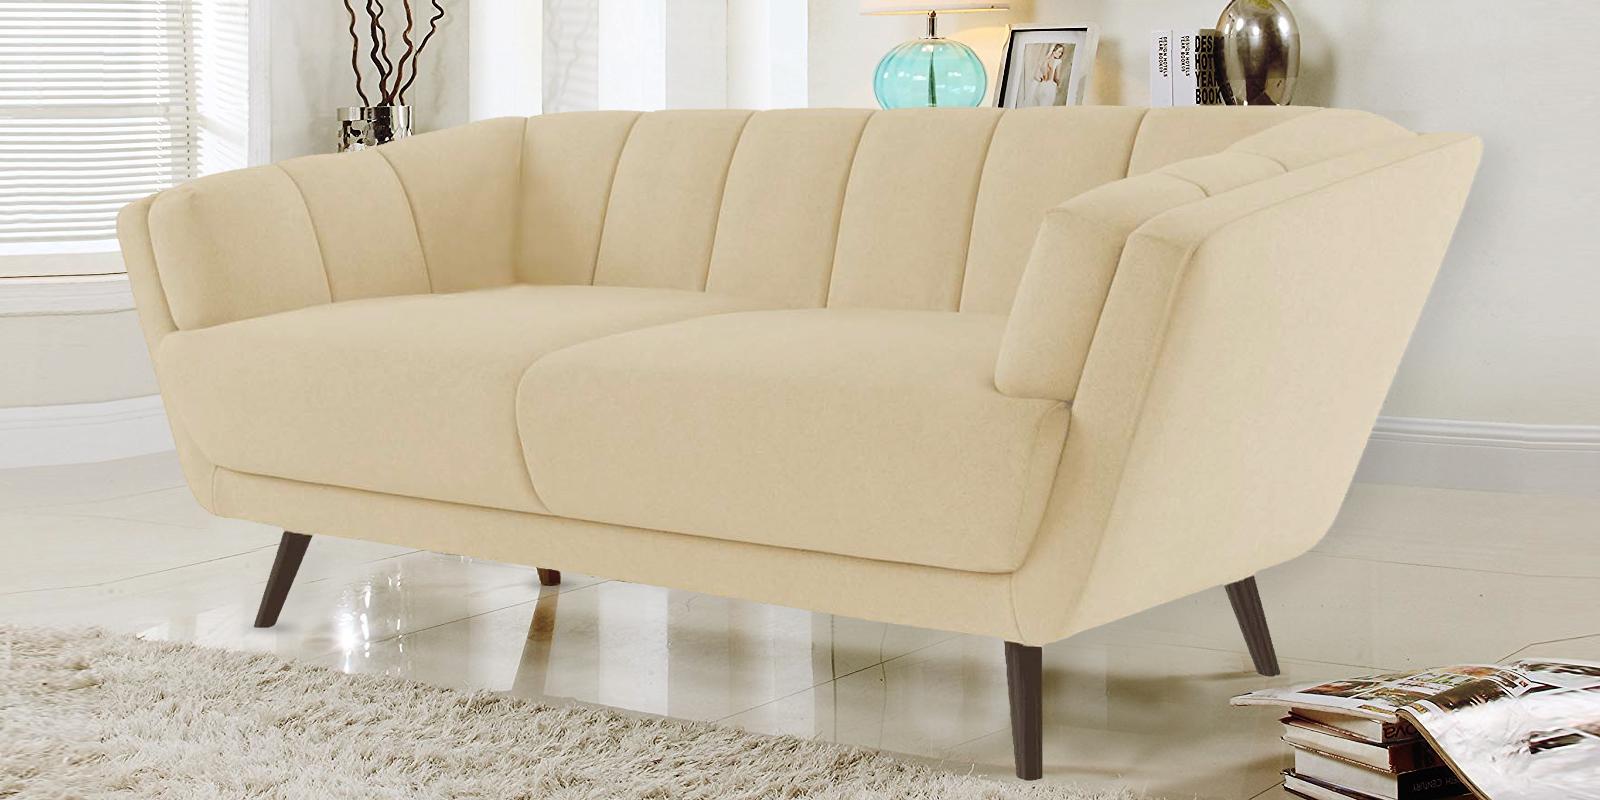 Terrific Acme Mid Century Two Seater Sofa Evergreenethics Interior Chair Design Evergreenethicsorg